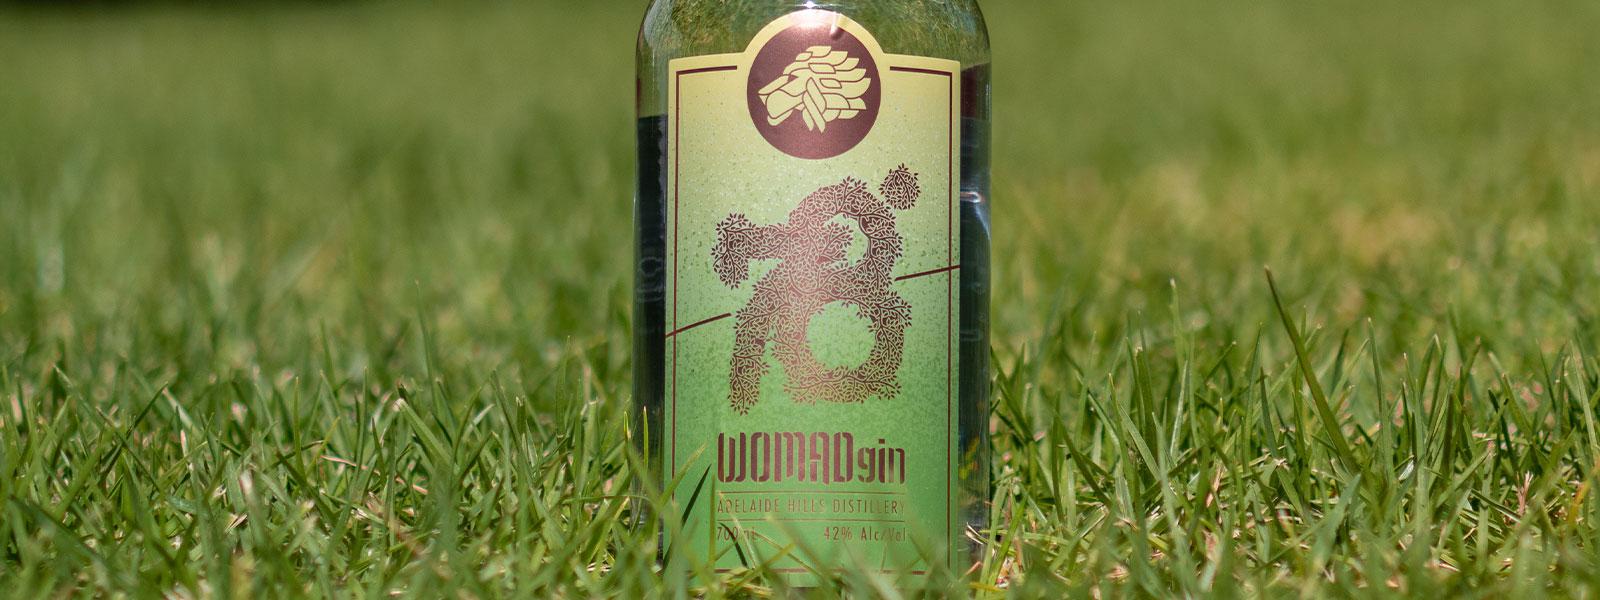 WOMADgin-1600x600